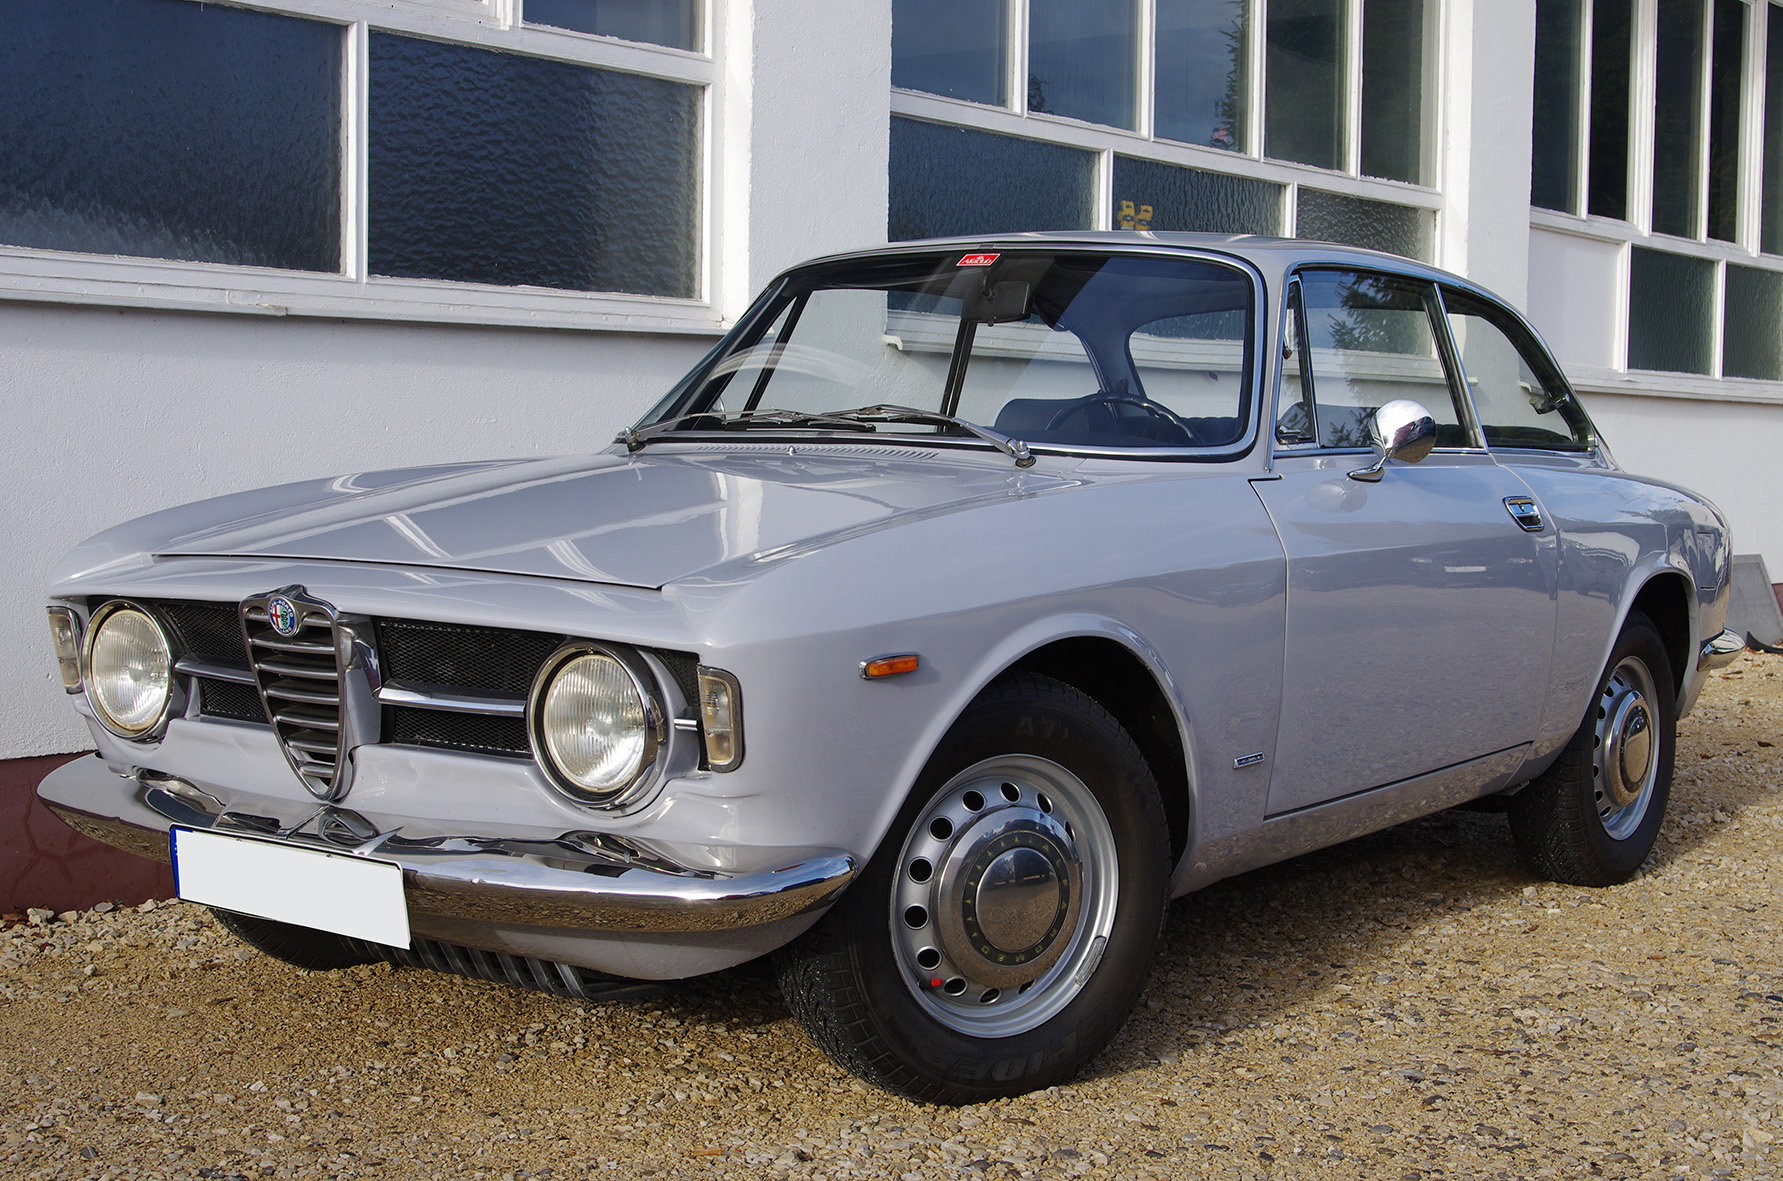 1967 Alfa Romeo Giulia GT 1300 Junior *restored* UK delivery poss SOLD (picture 1 of 6)